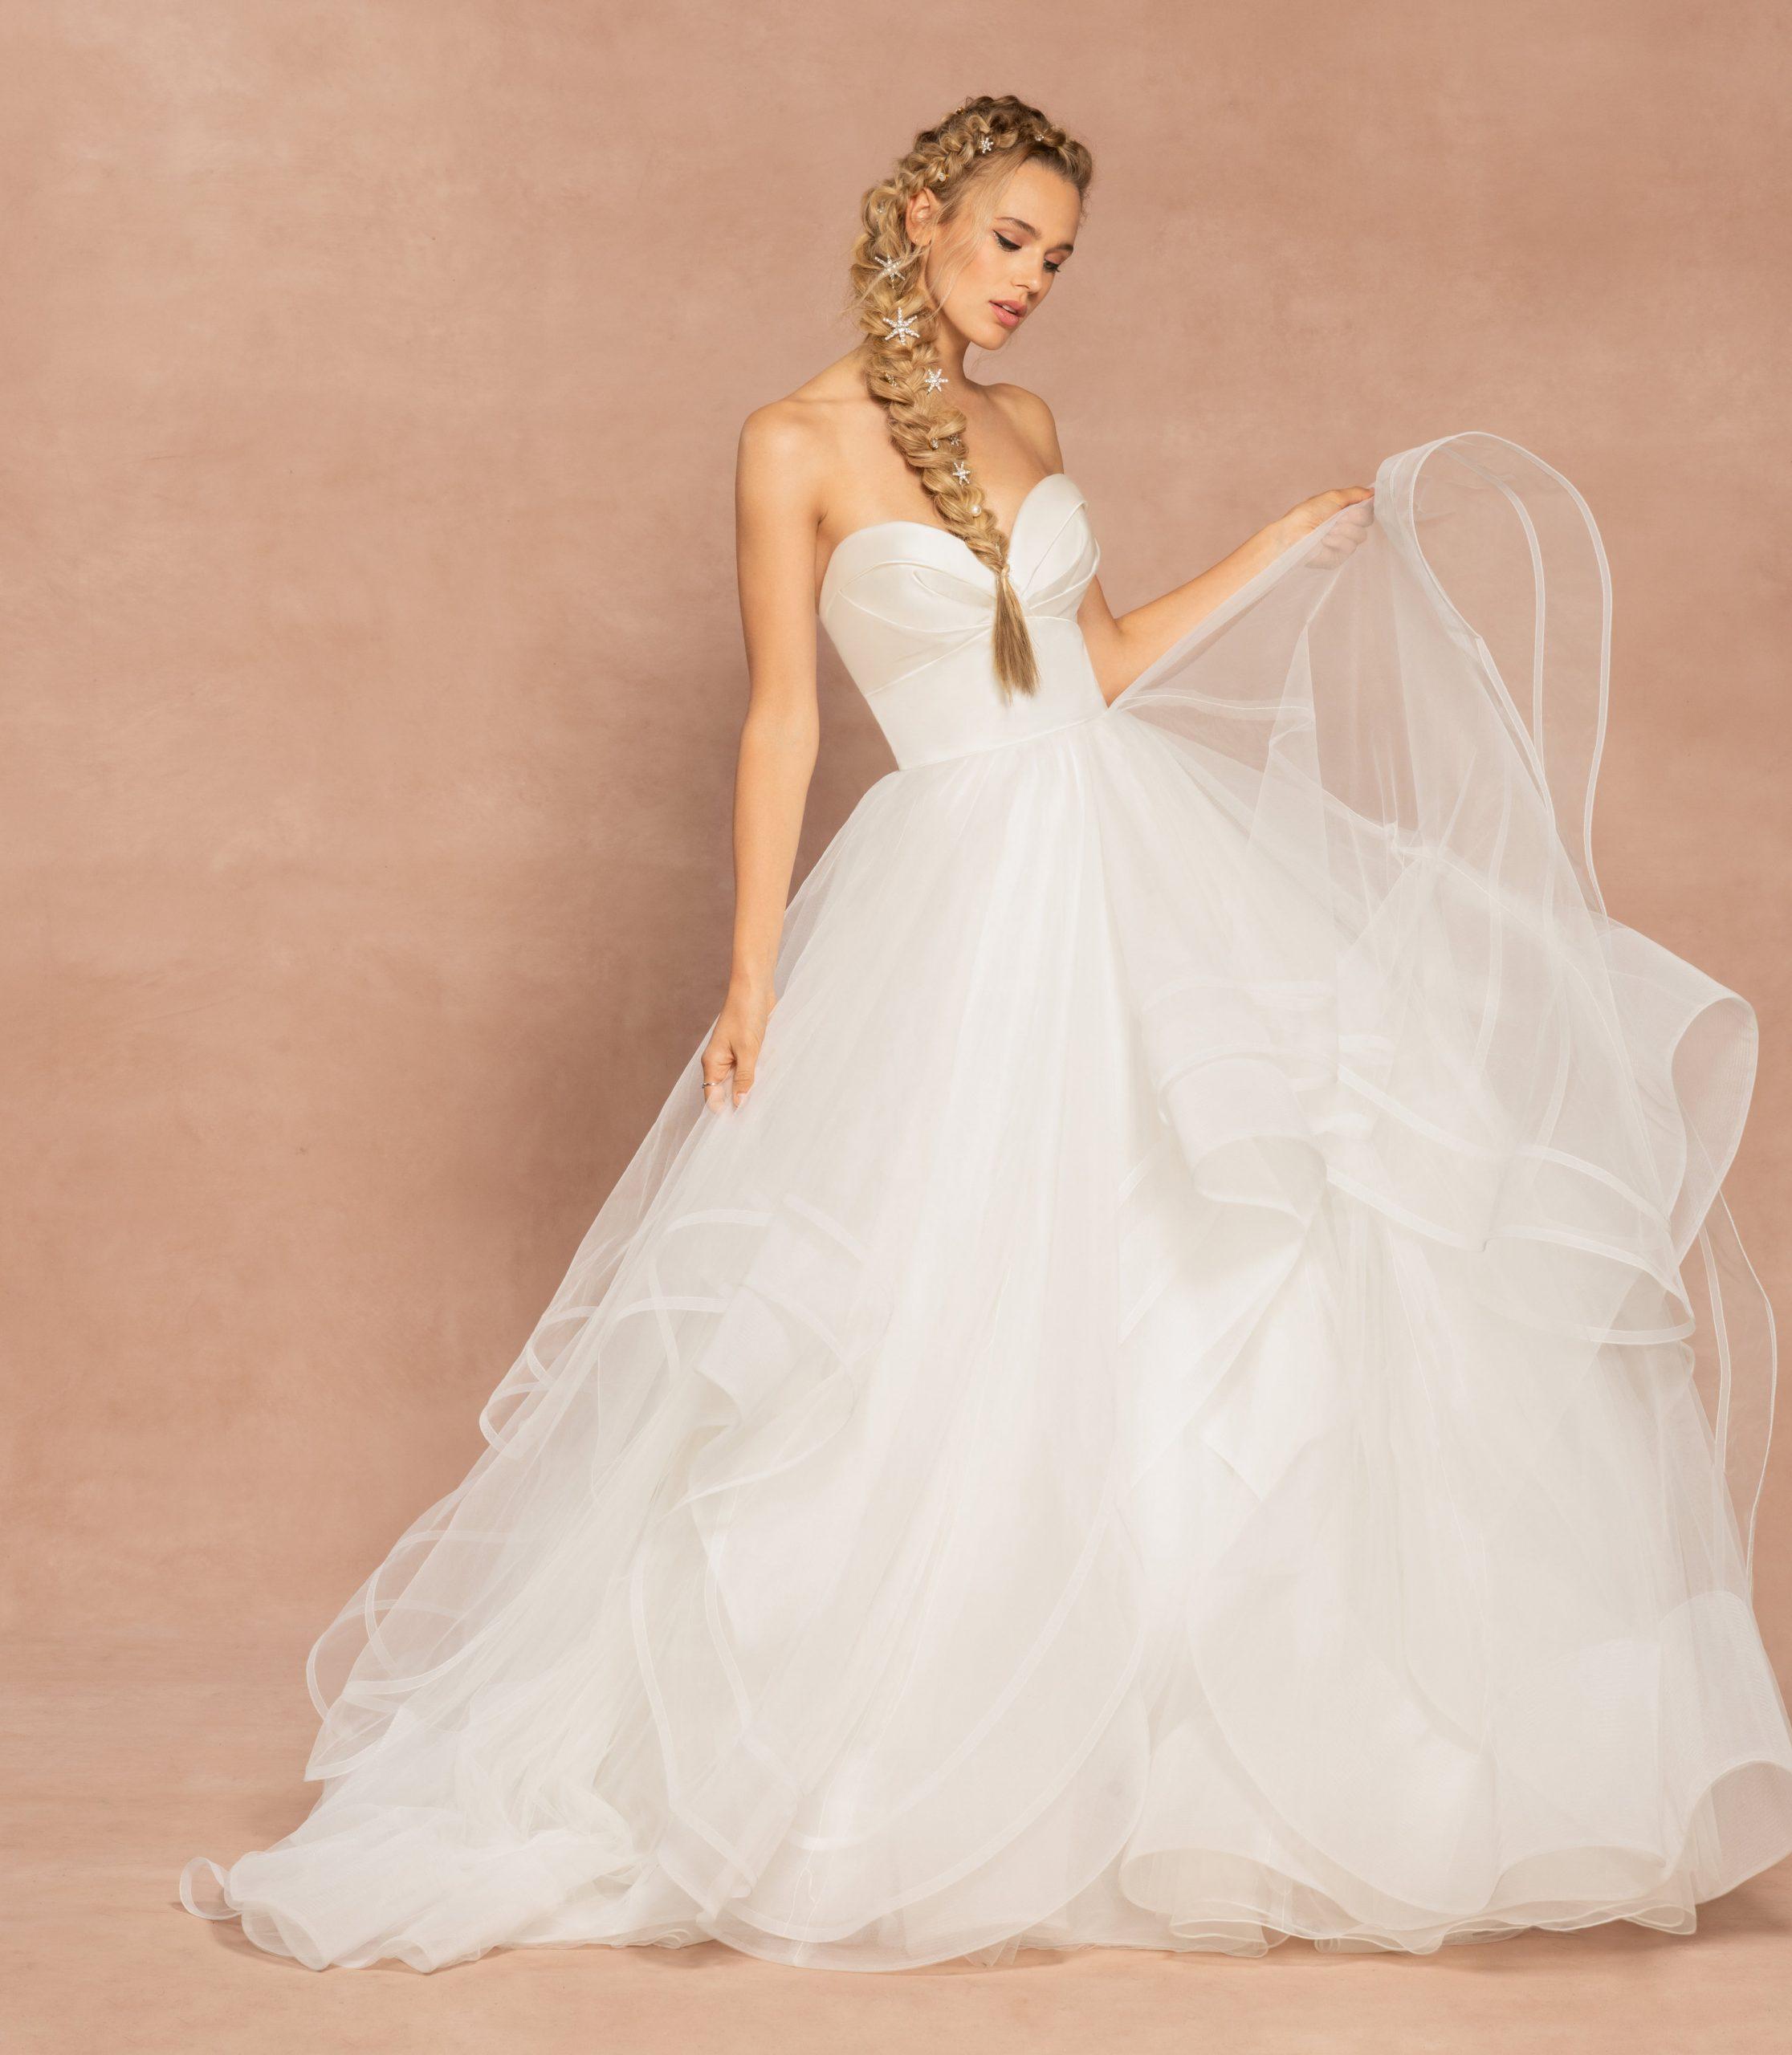 Strapless Sweetheart Neckline Ball Gown Tulle Wedding Dress Kleinfeld Bridal